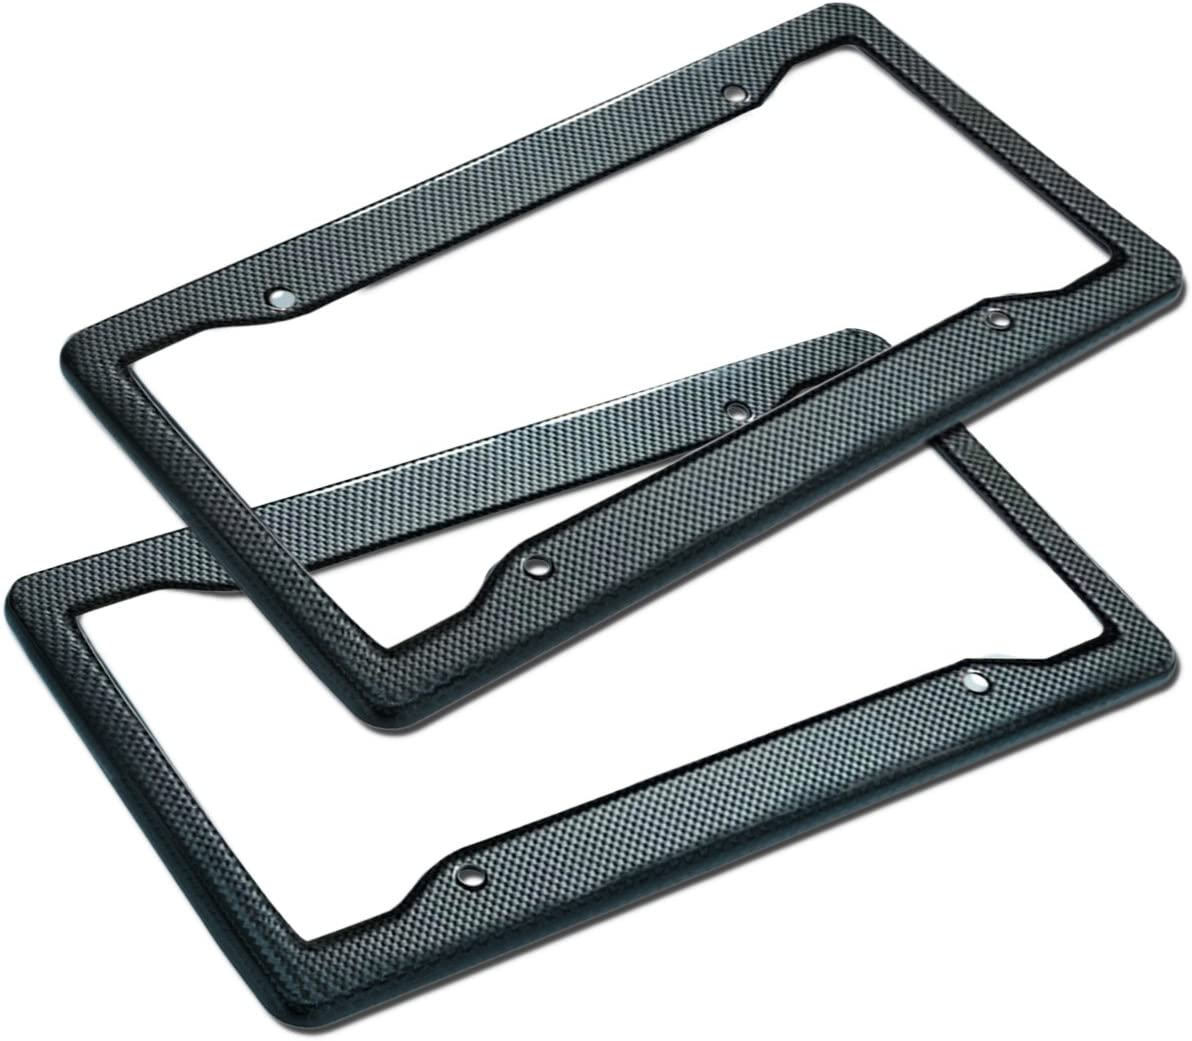 Zone Tech Carbon Fiber Plastic License Plate Cover Frame - 2-Pack Classic Black Premium Quality Standard Fit Novelty/License Plate Frame